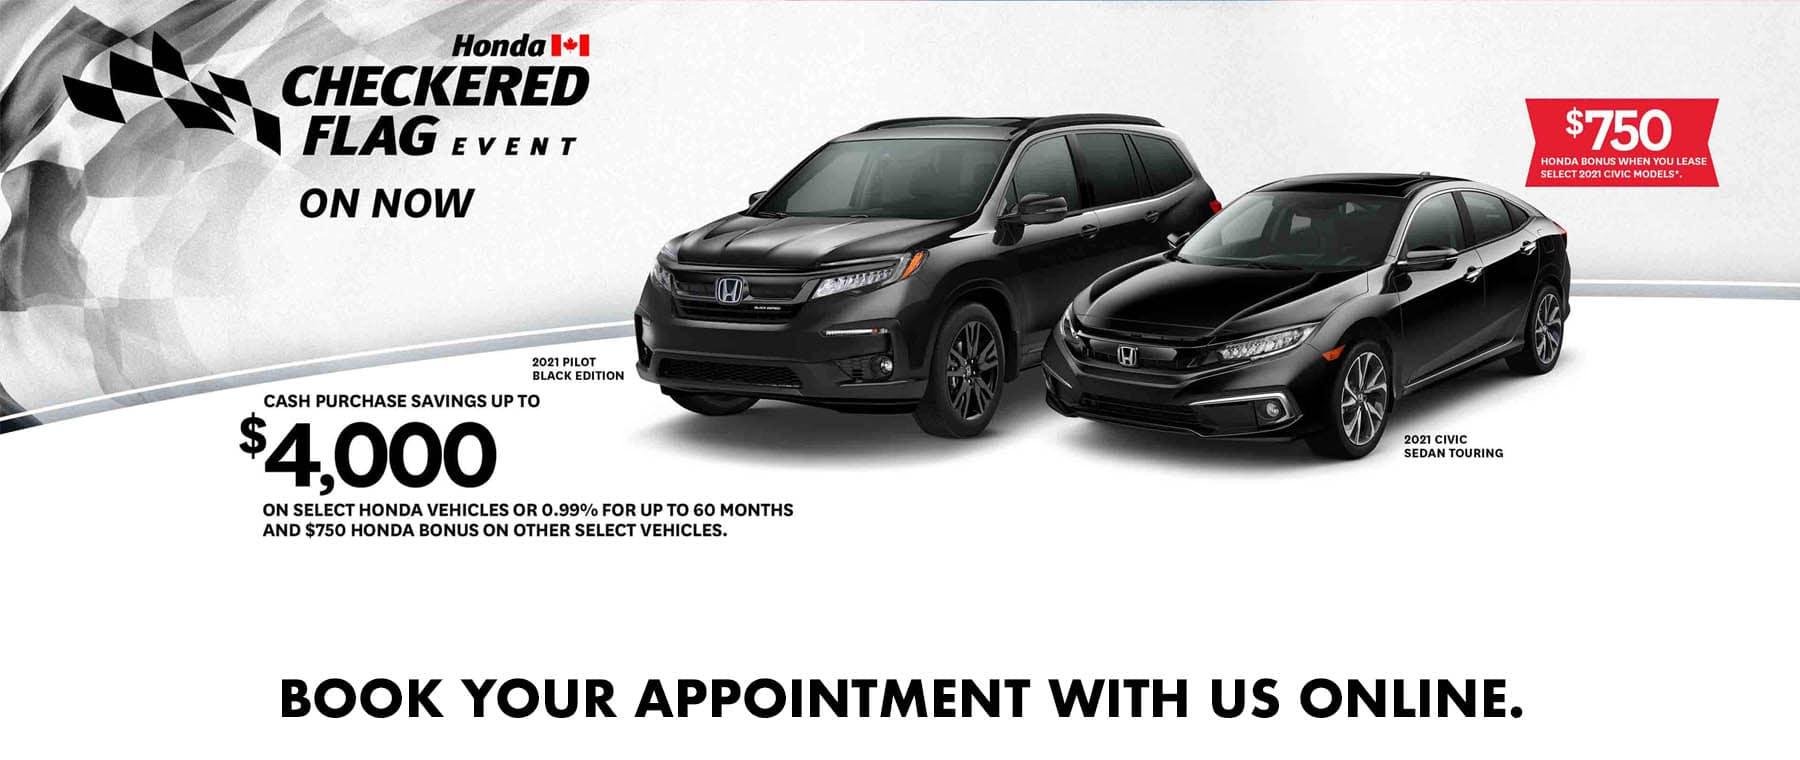 Pickering-Honda-Homepage-image